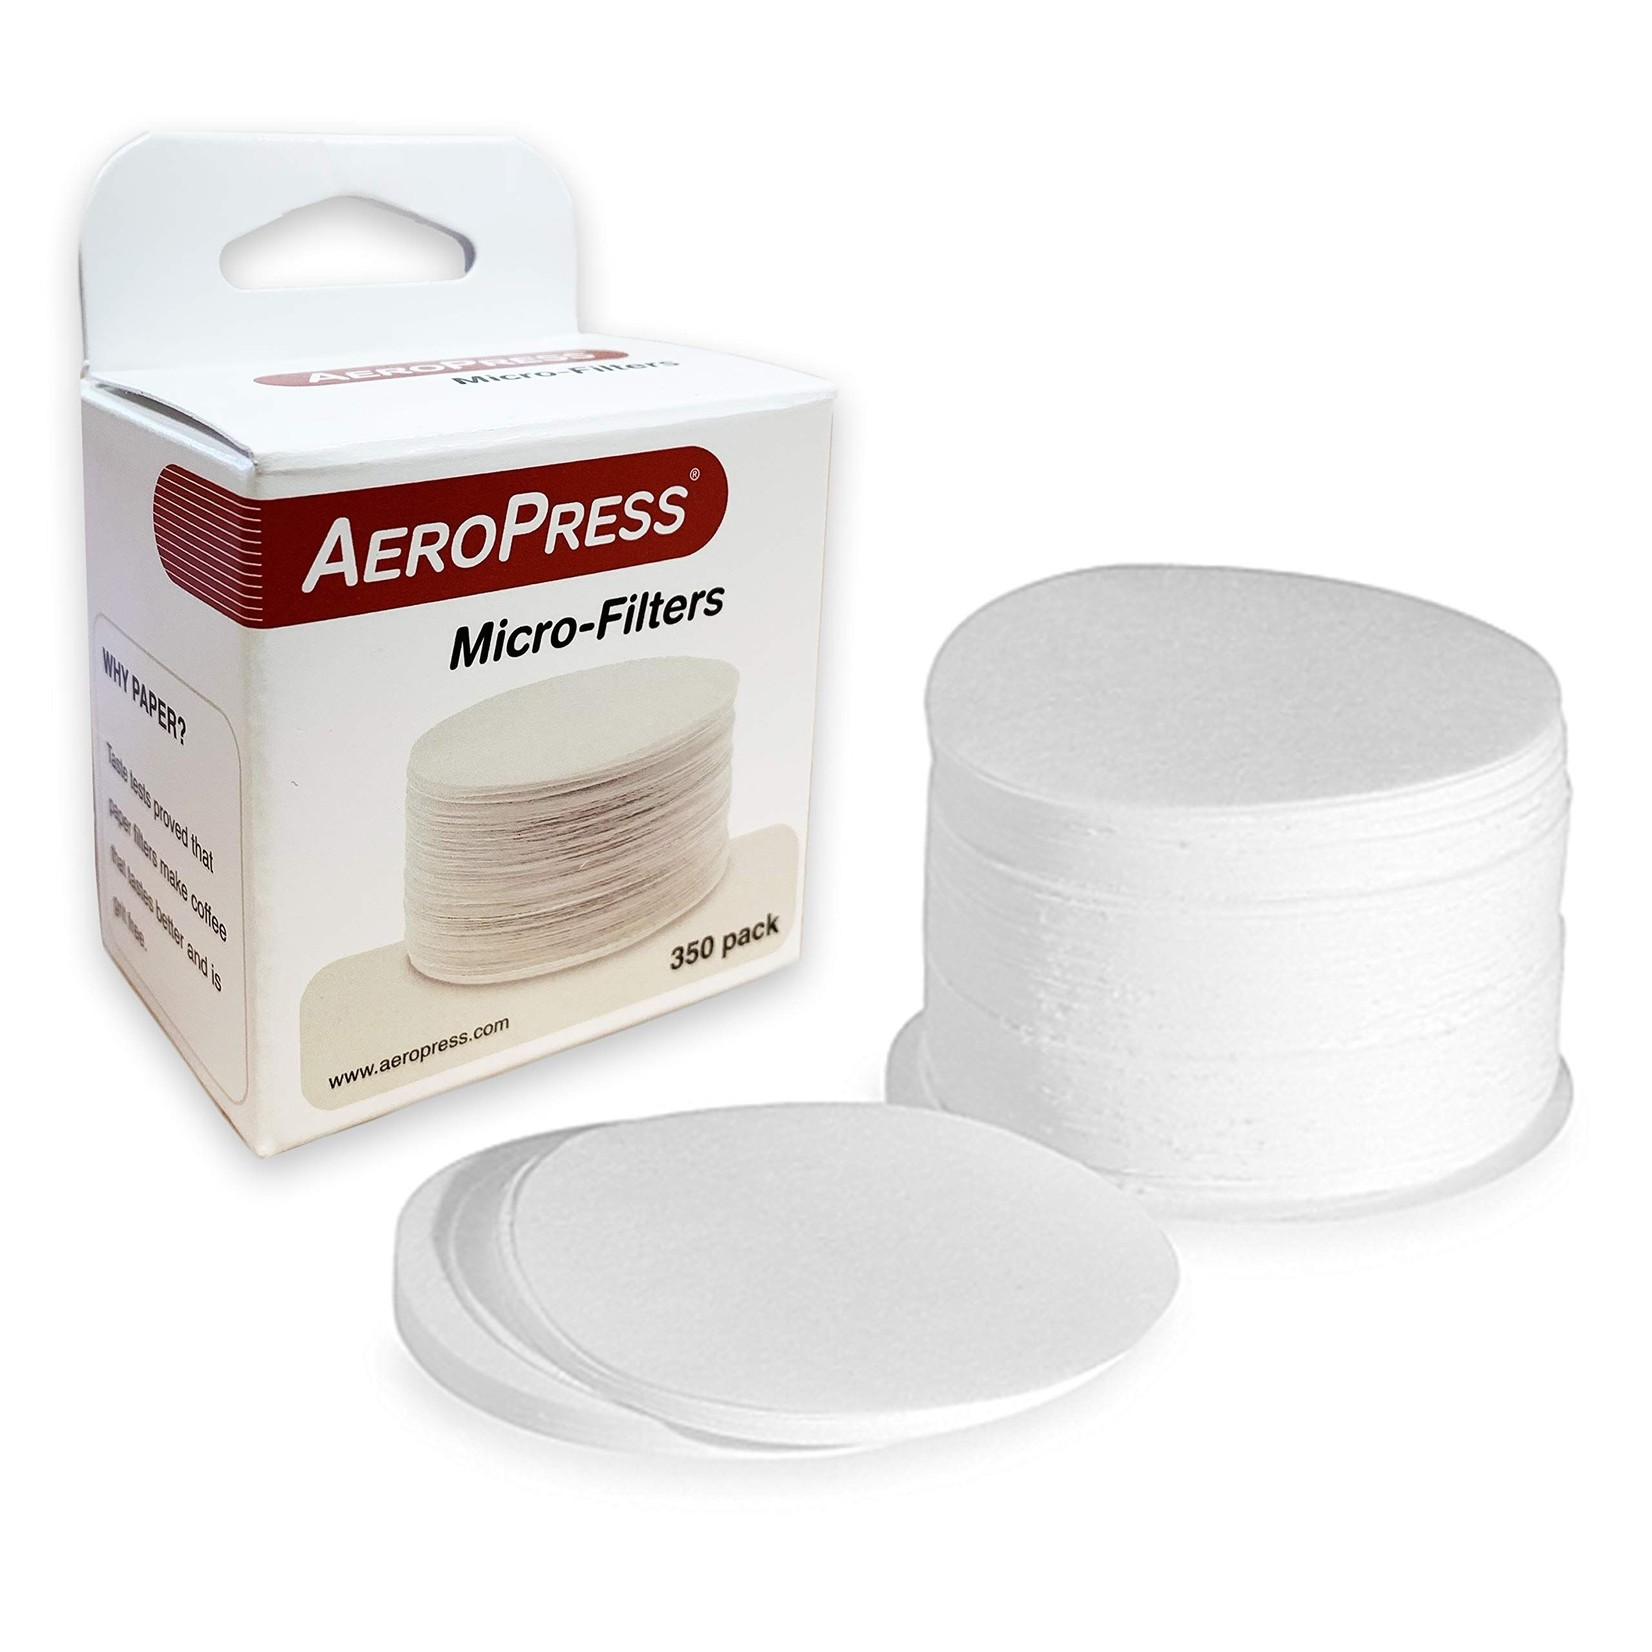 AeroPress AeroPress, Replacement Filter Pack